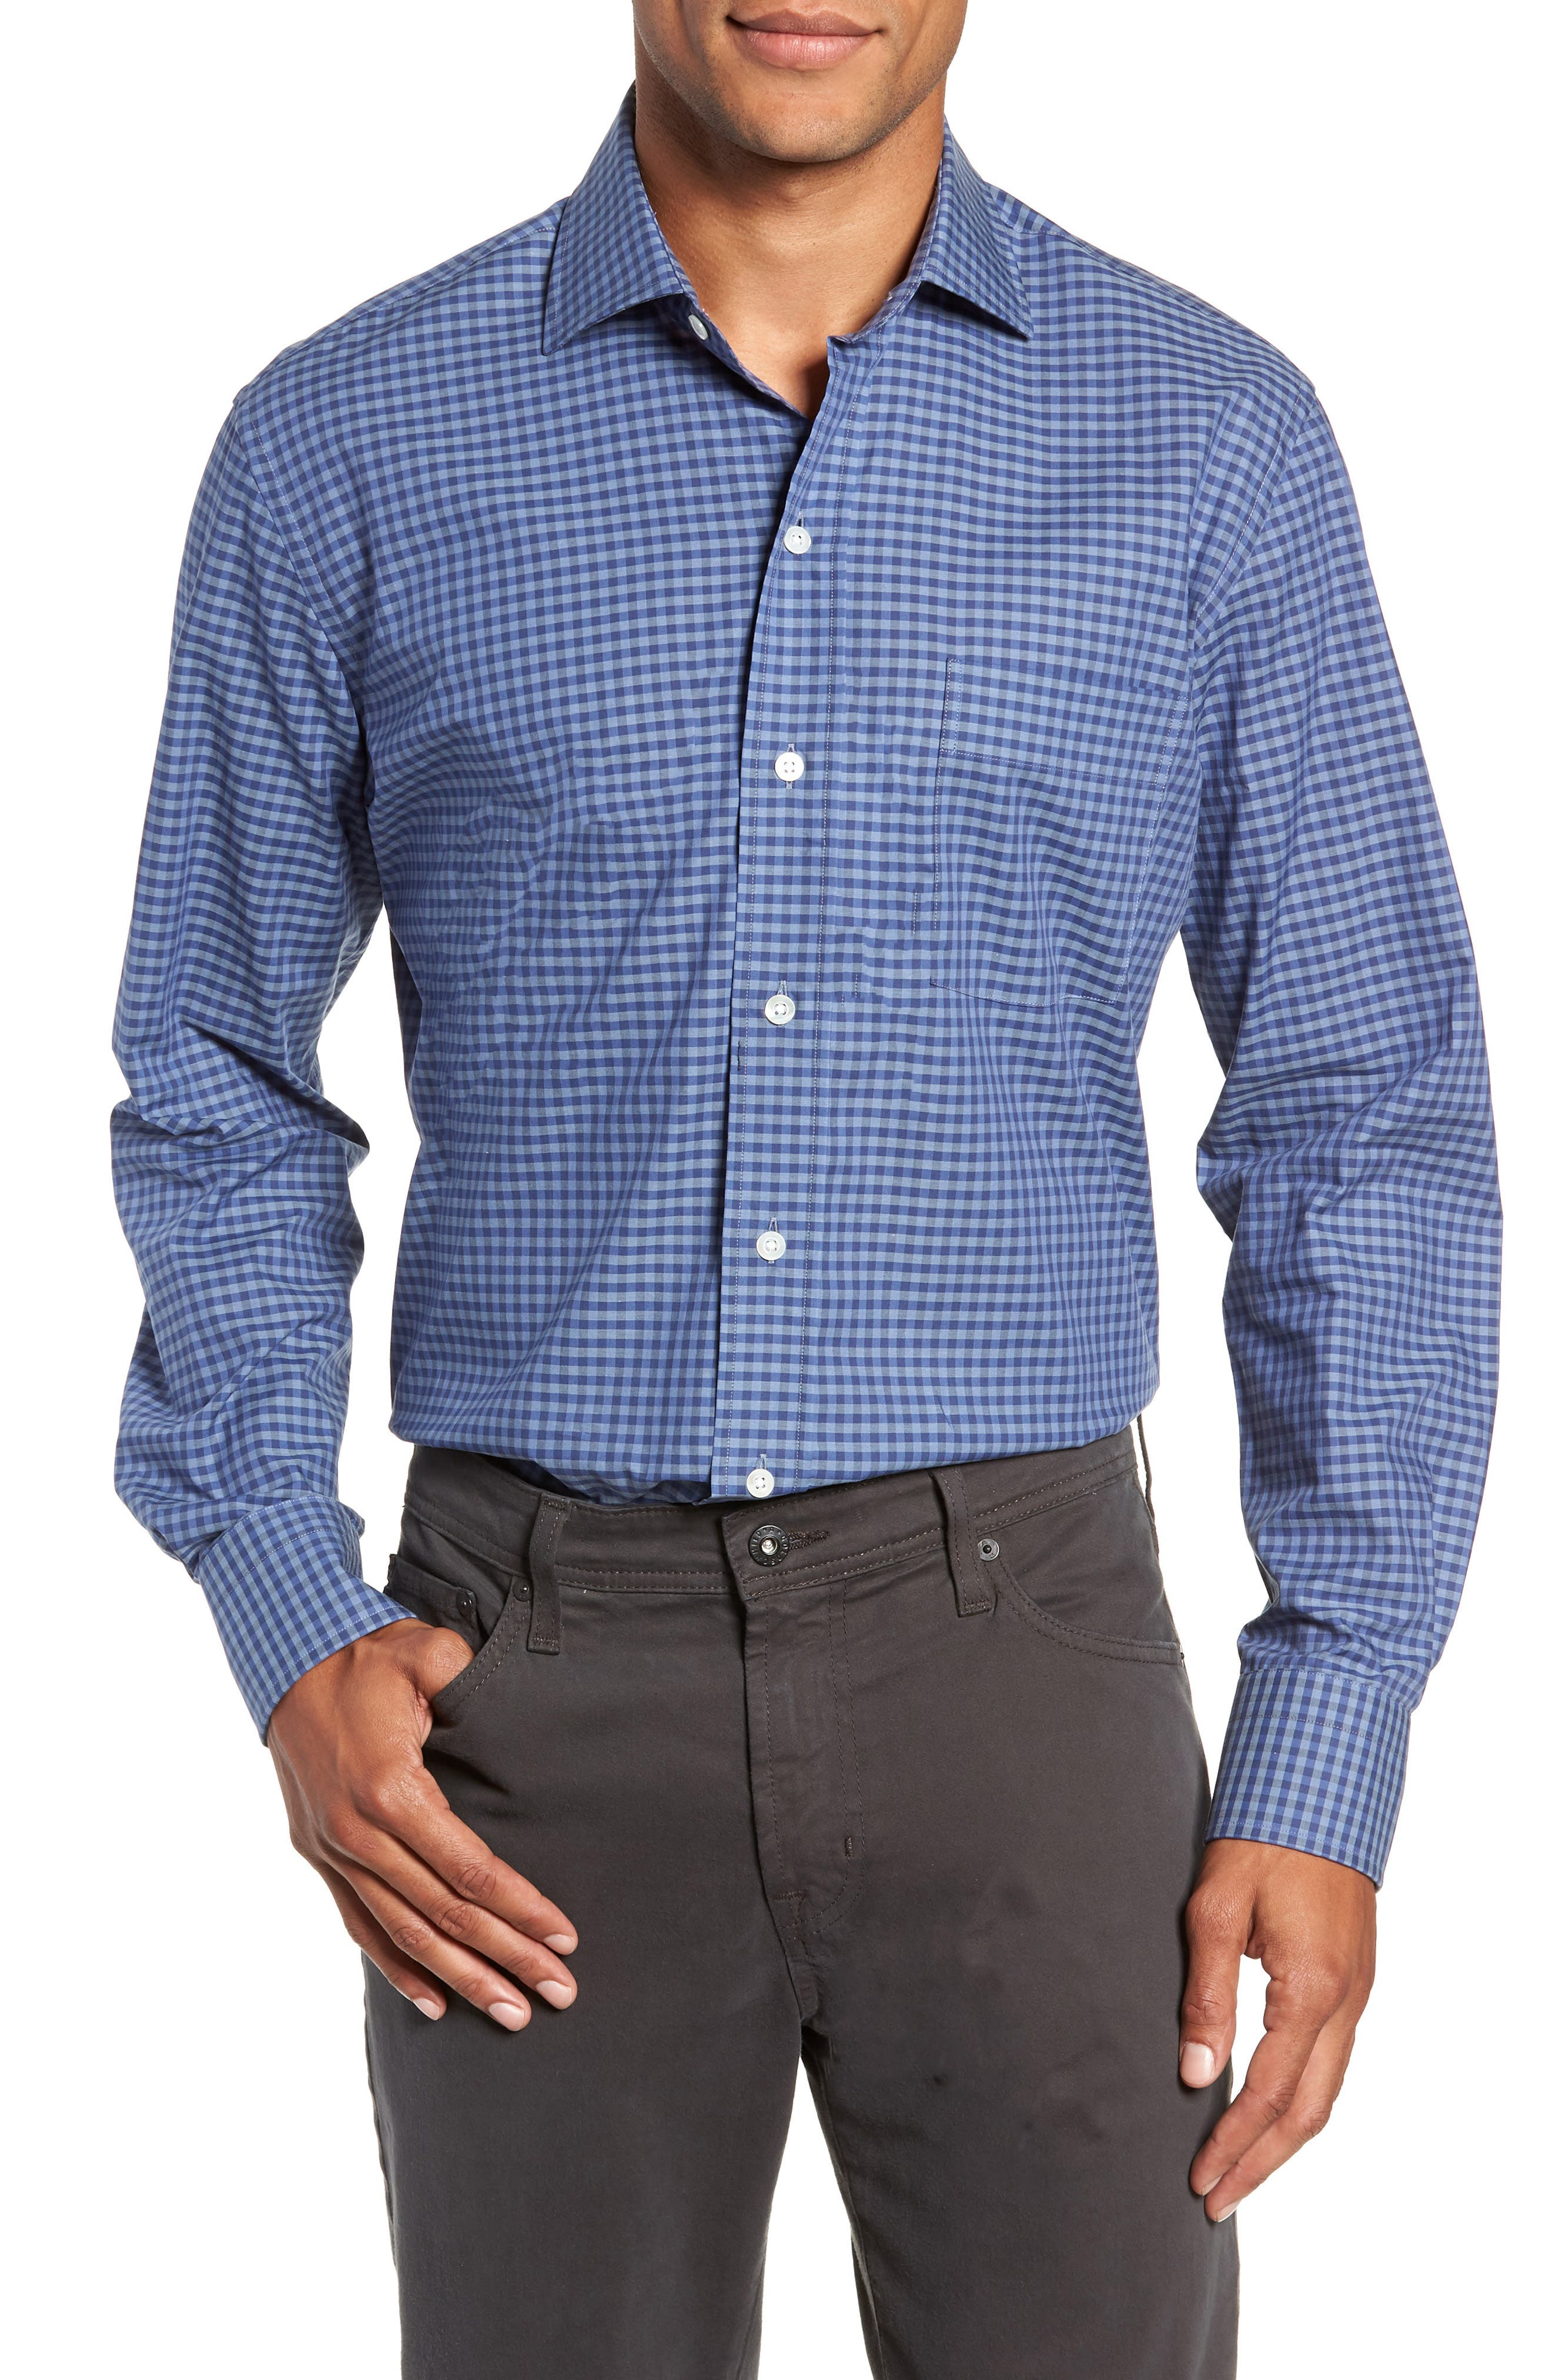 LEDBURY Fairlee Gingham Slim Fit Dress Shirt in Dark Blue